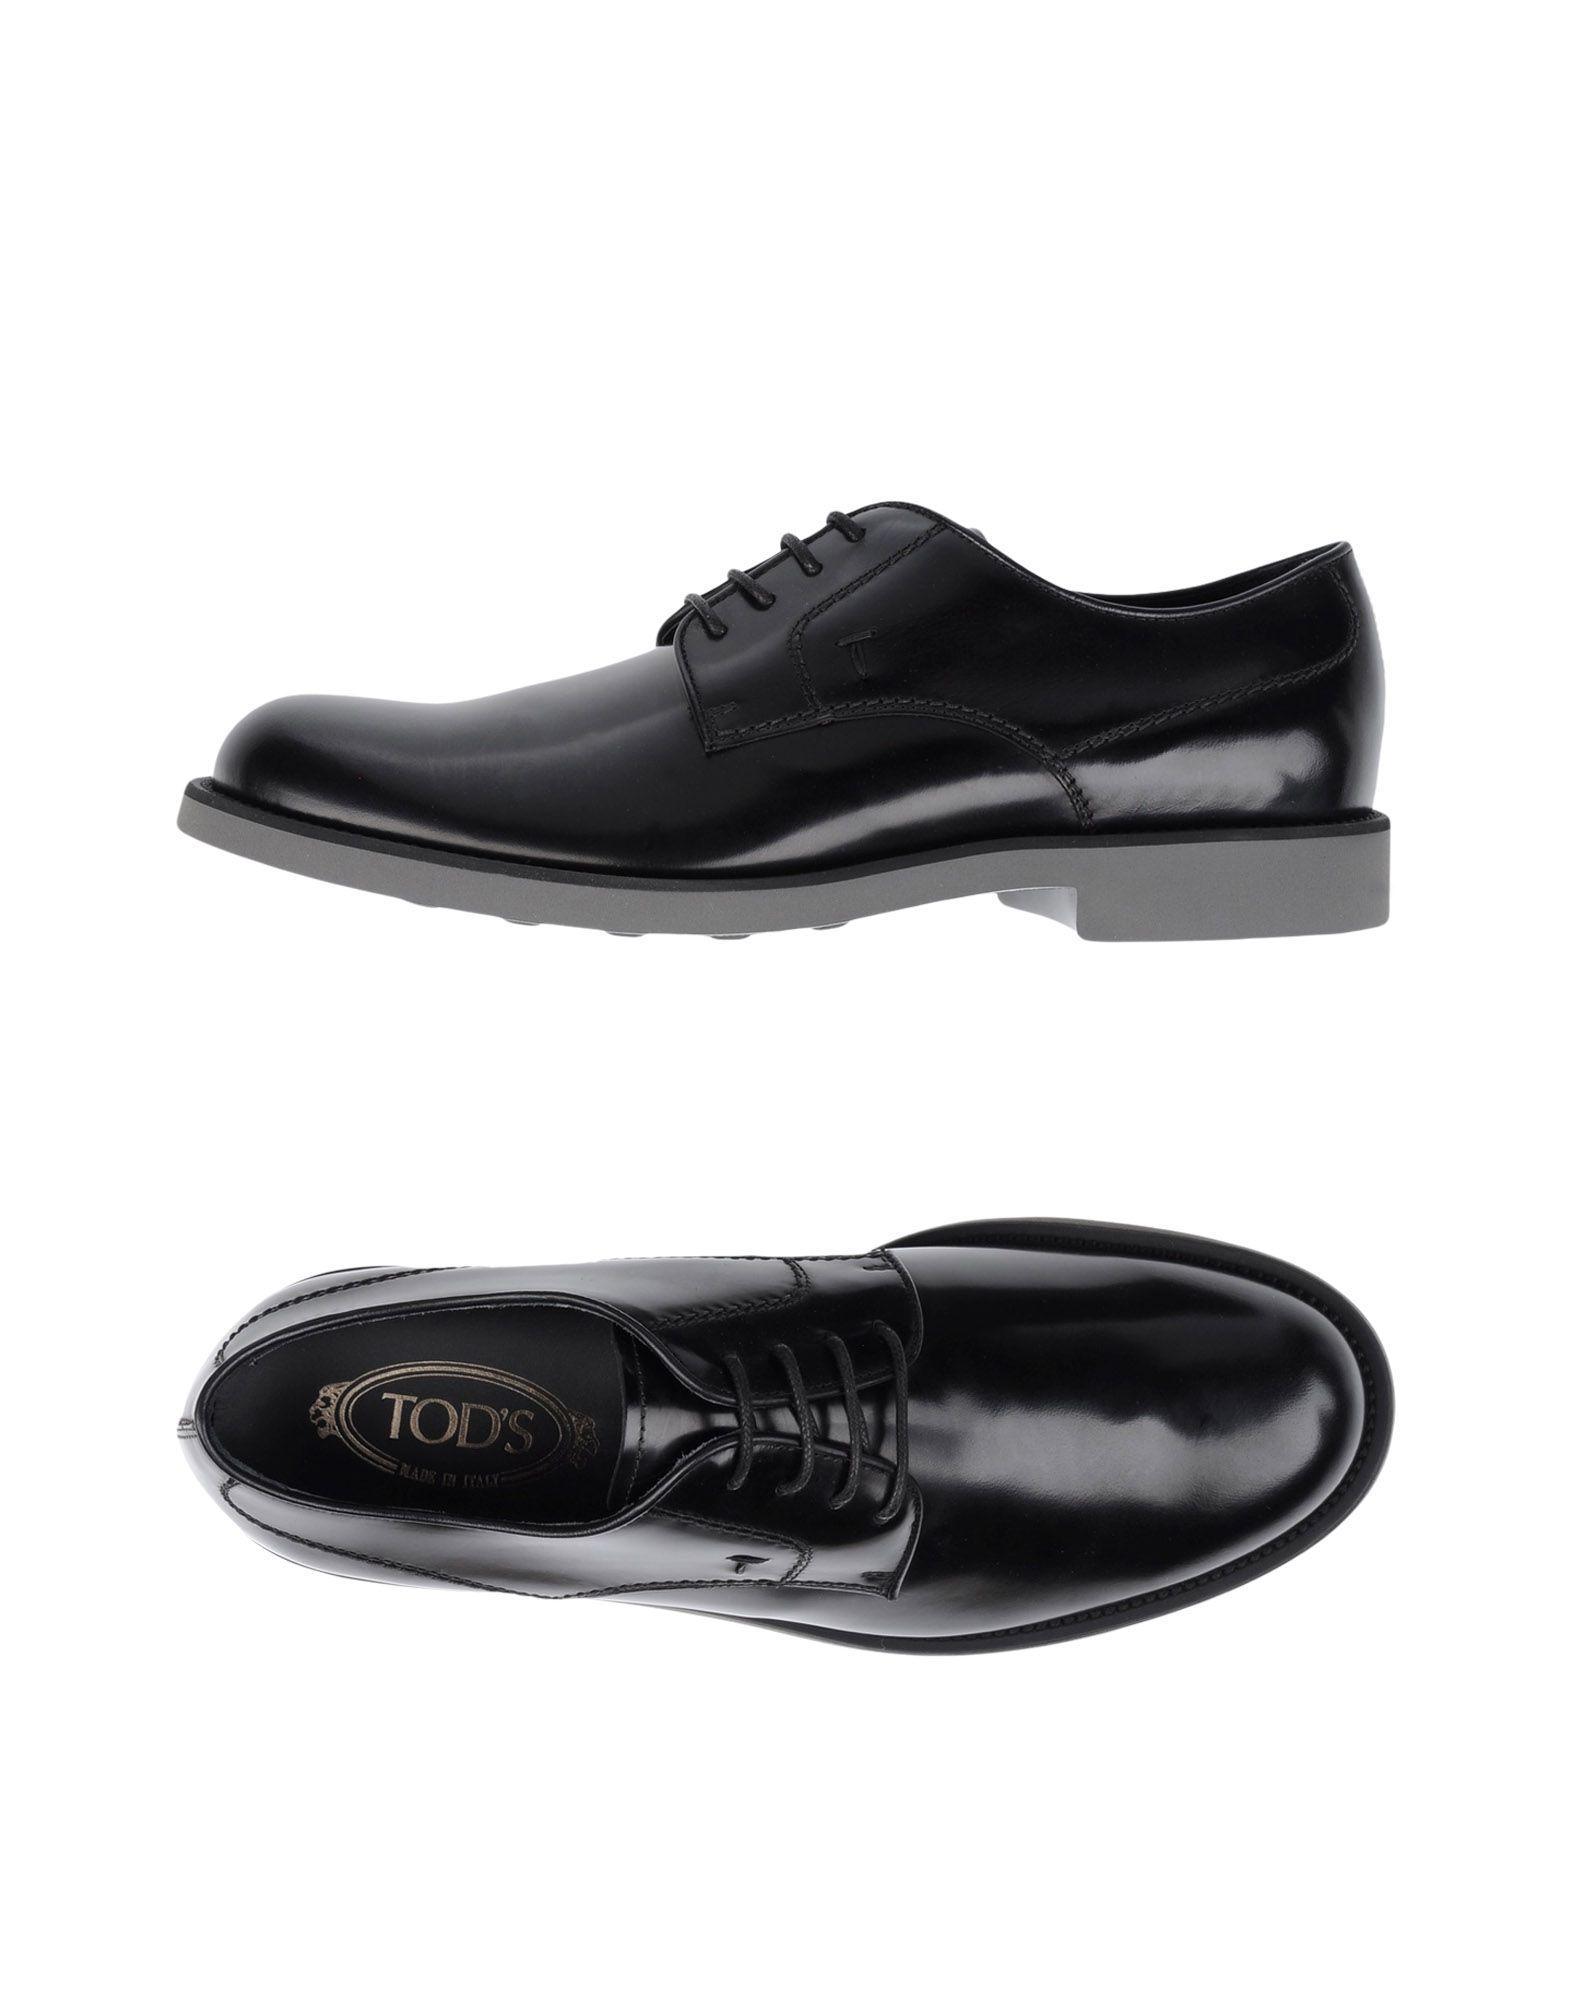 Tod's Tod's  Schnürschuhe Herren  11242872AC Heiße Schuhe 48056c